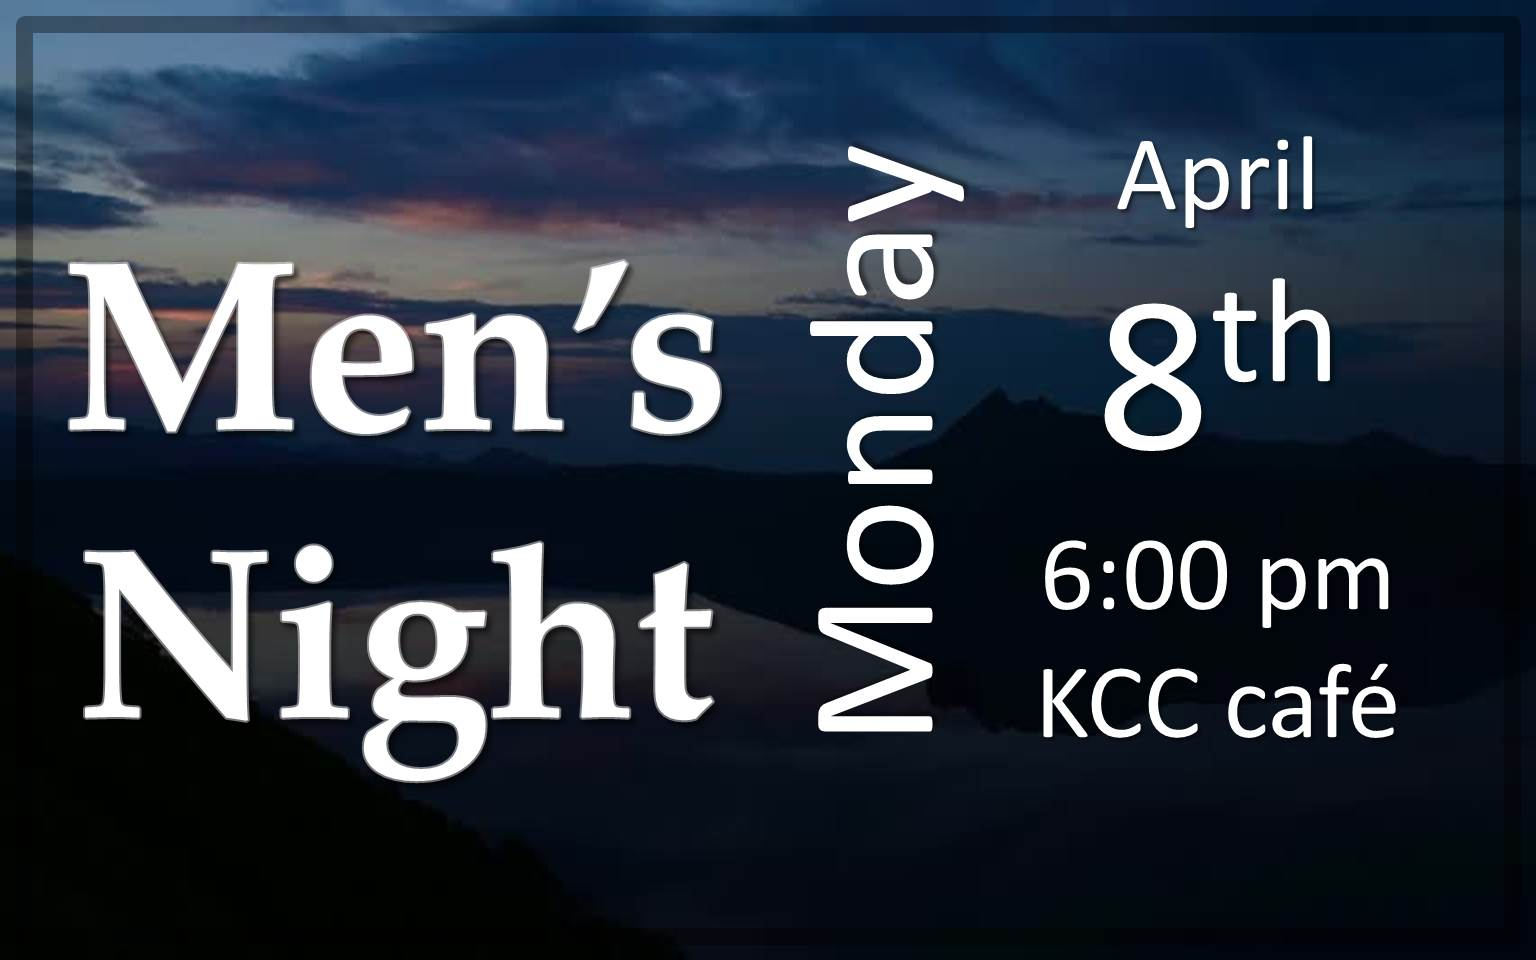 Men's Night 4.8.19 jpeg.jpg